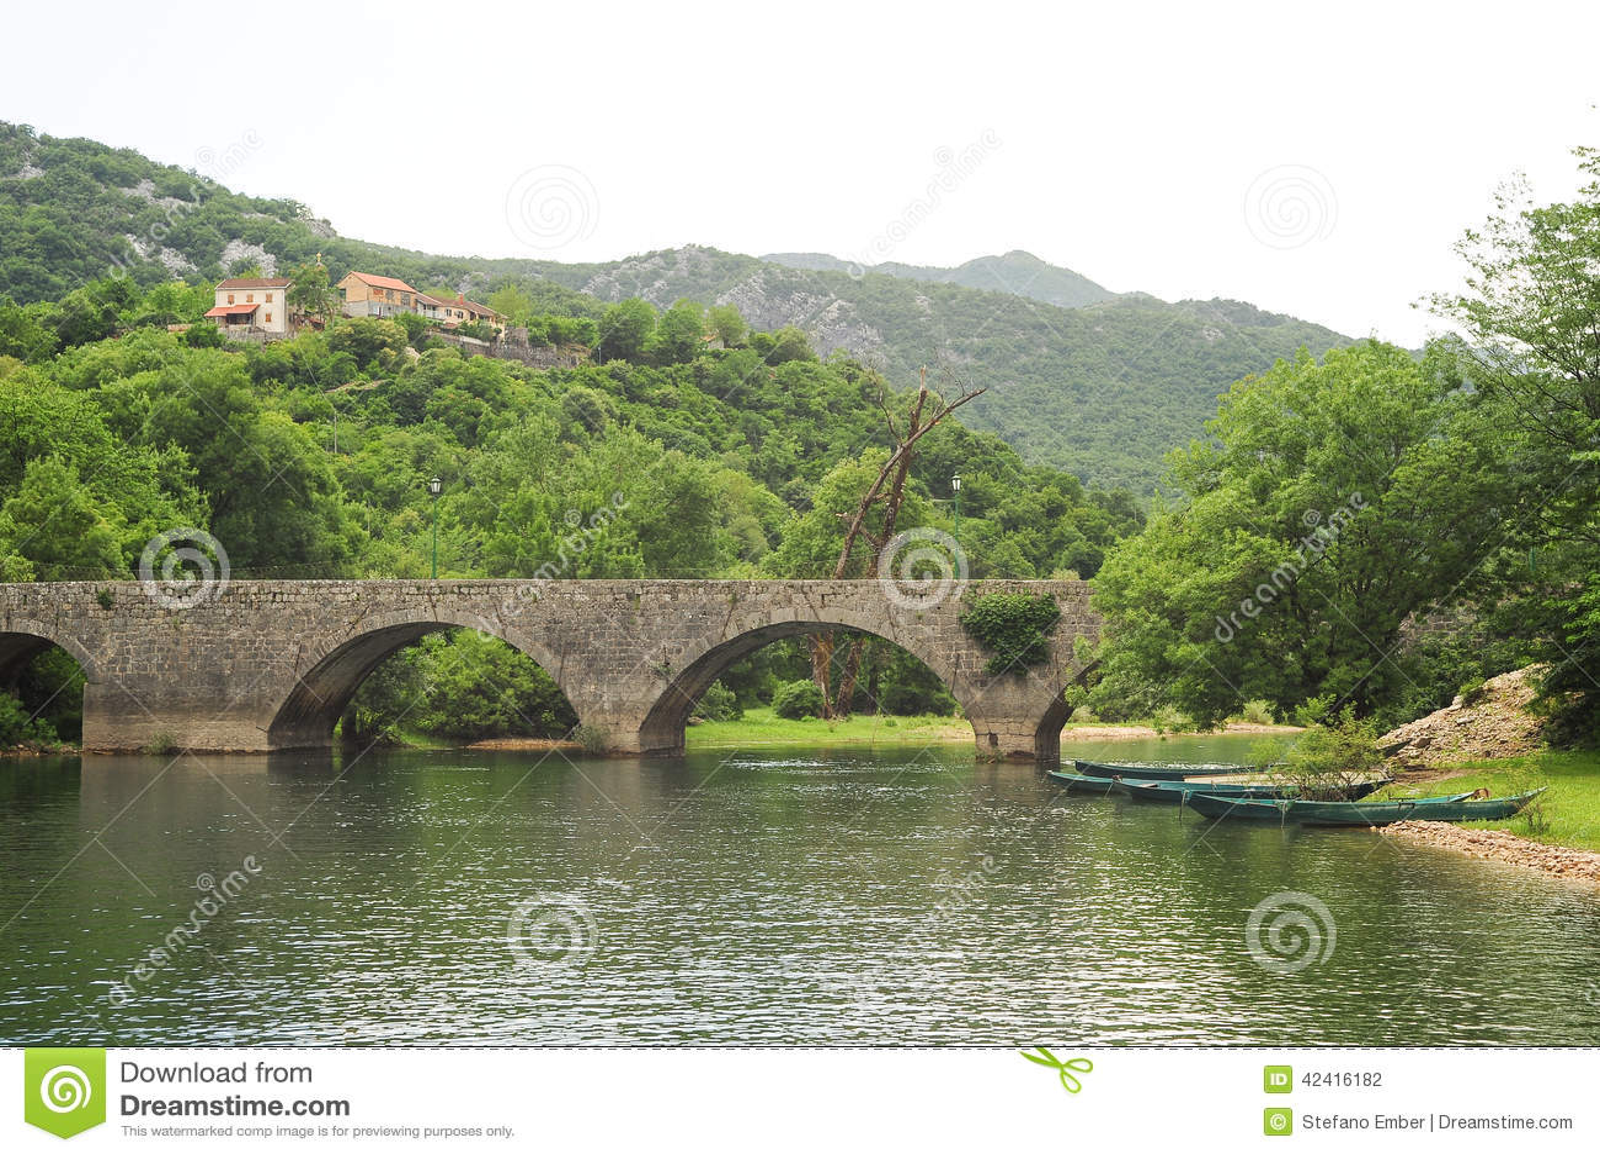 The old arched stone bridge of Rijeka Crnojevica